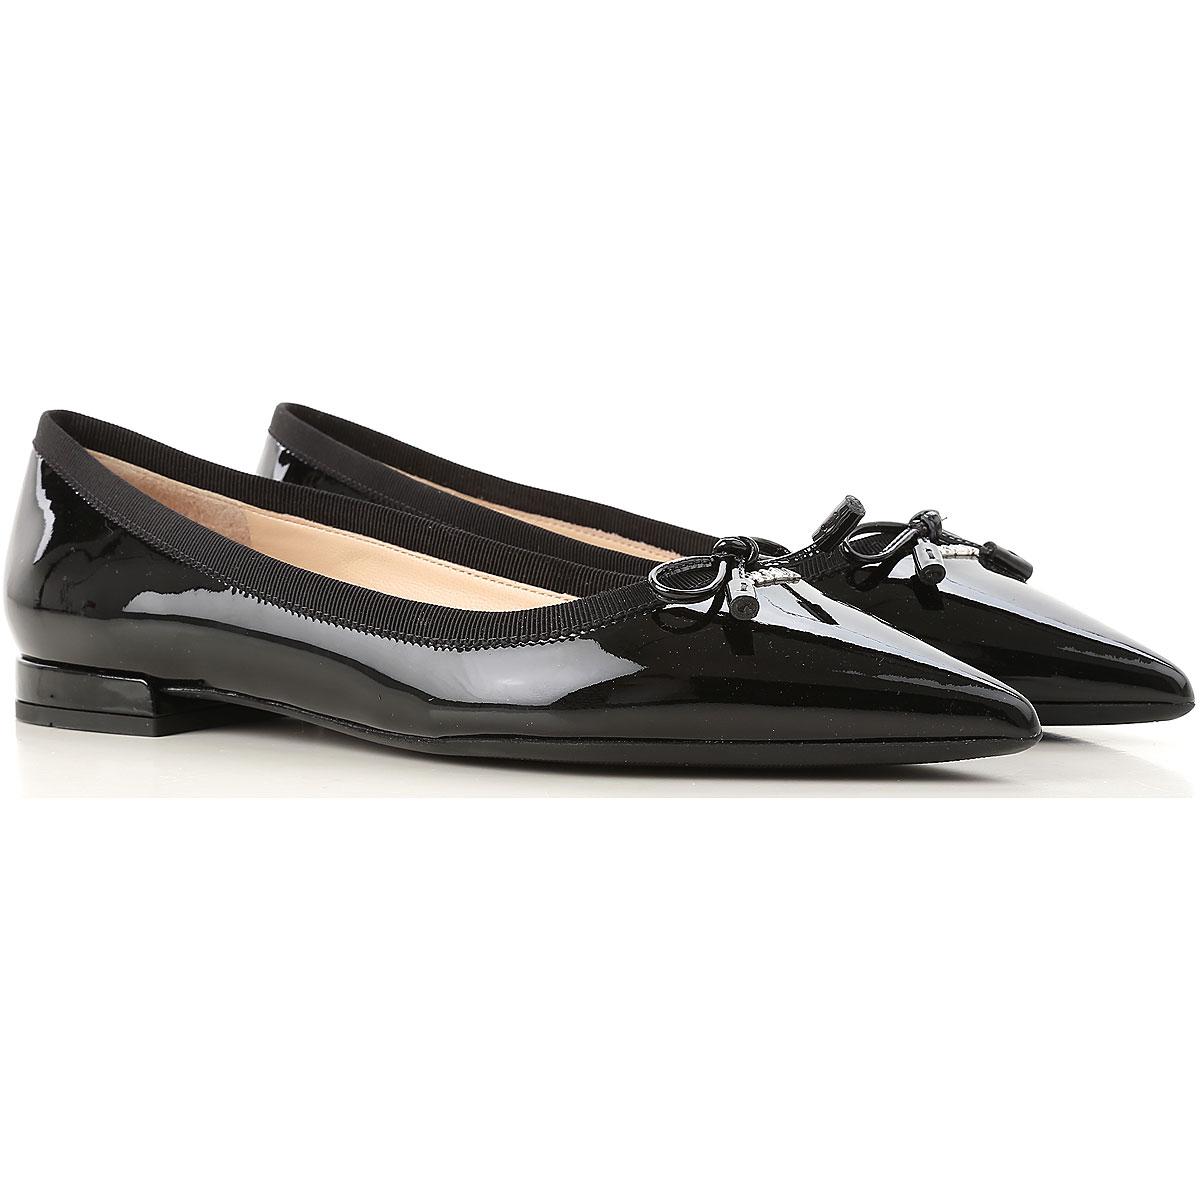 Image of Prada Ballet Flats Ballerina Shoes for Women, Black, Patent Leather, 2017, 10 6 6.5 7 8.5 9 9.5